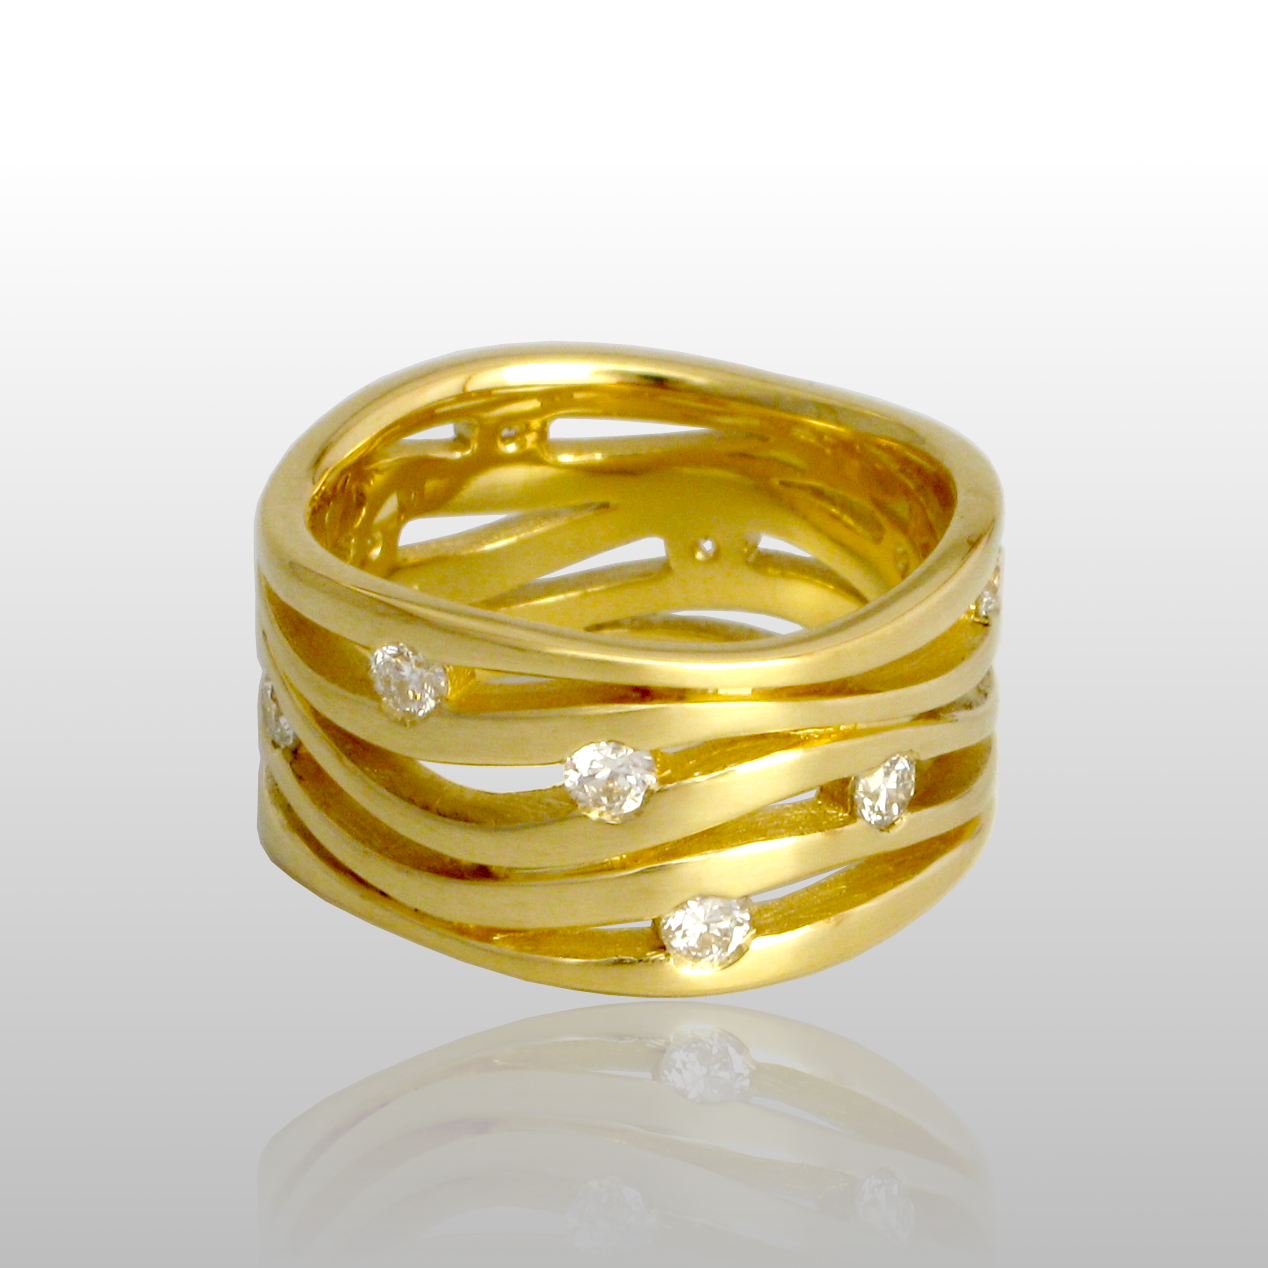 'Lamello' - contemporary wave ring in 18k gold with 12 diamonds .75ct t.w. by Pratima Design Fine Art Jewelry